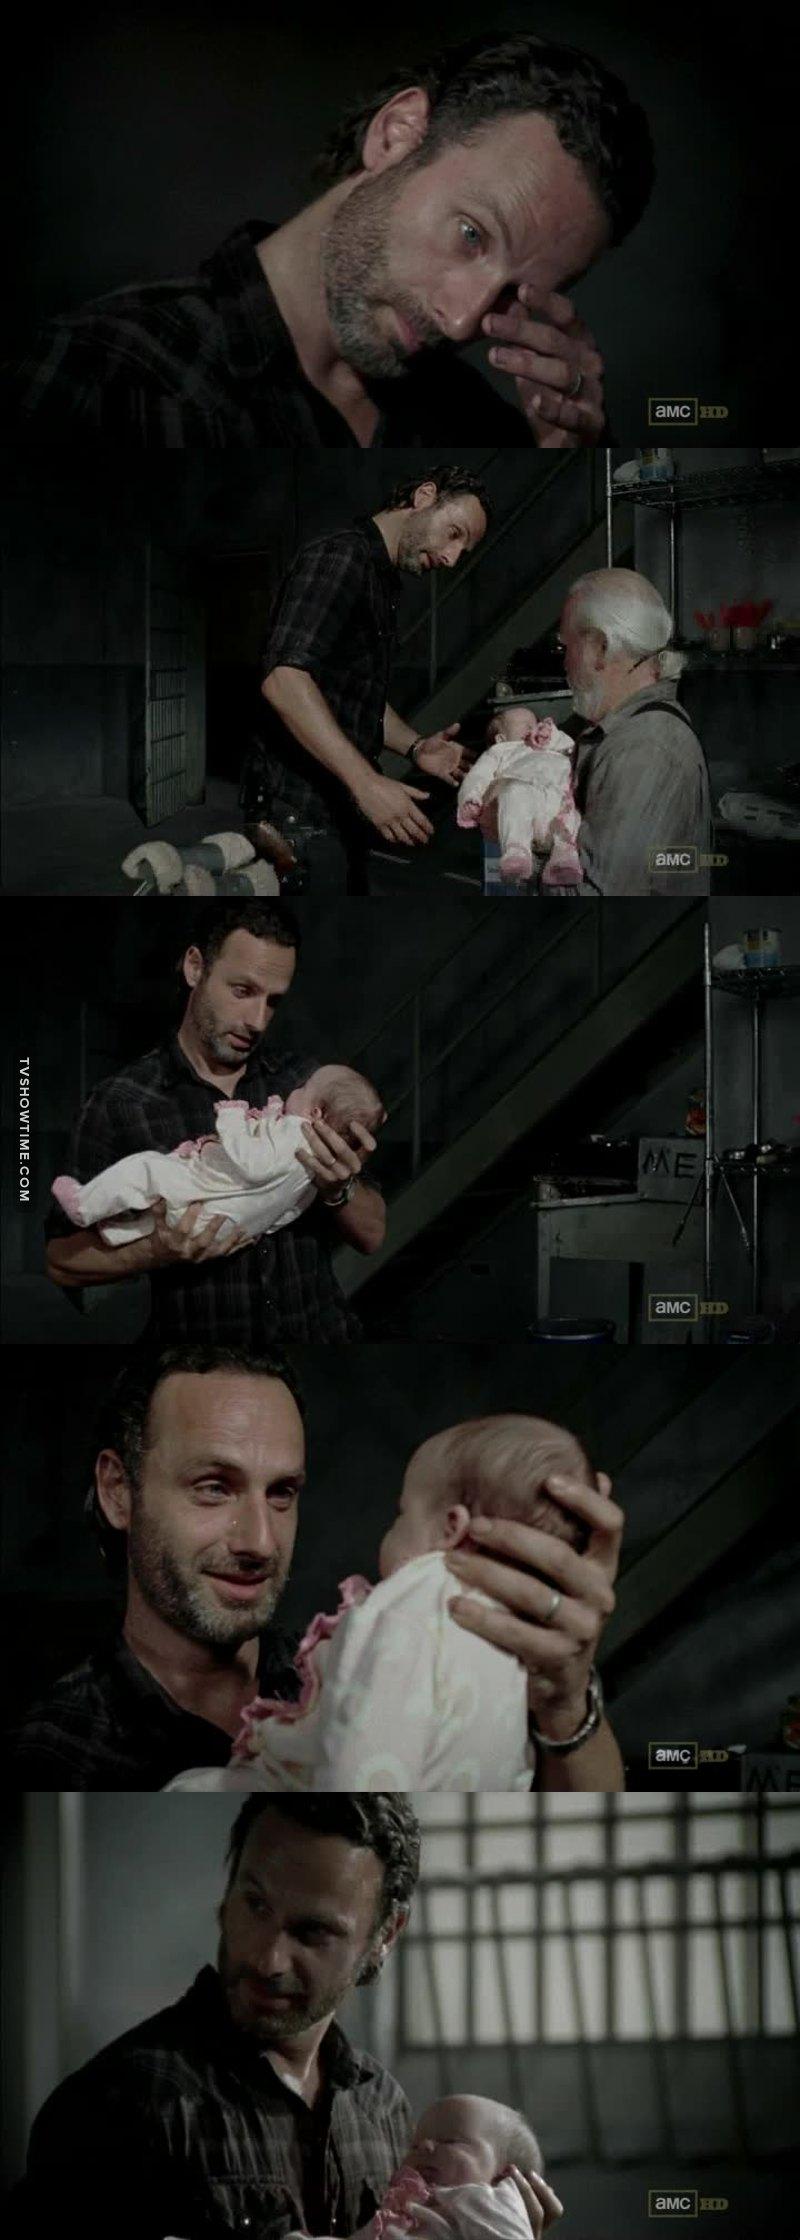 He finally held his daughter 😢❤️